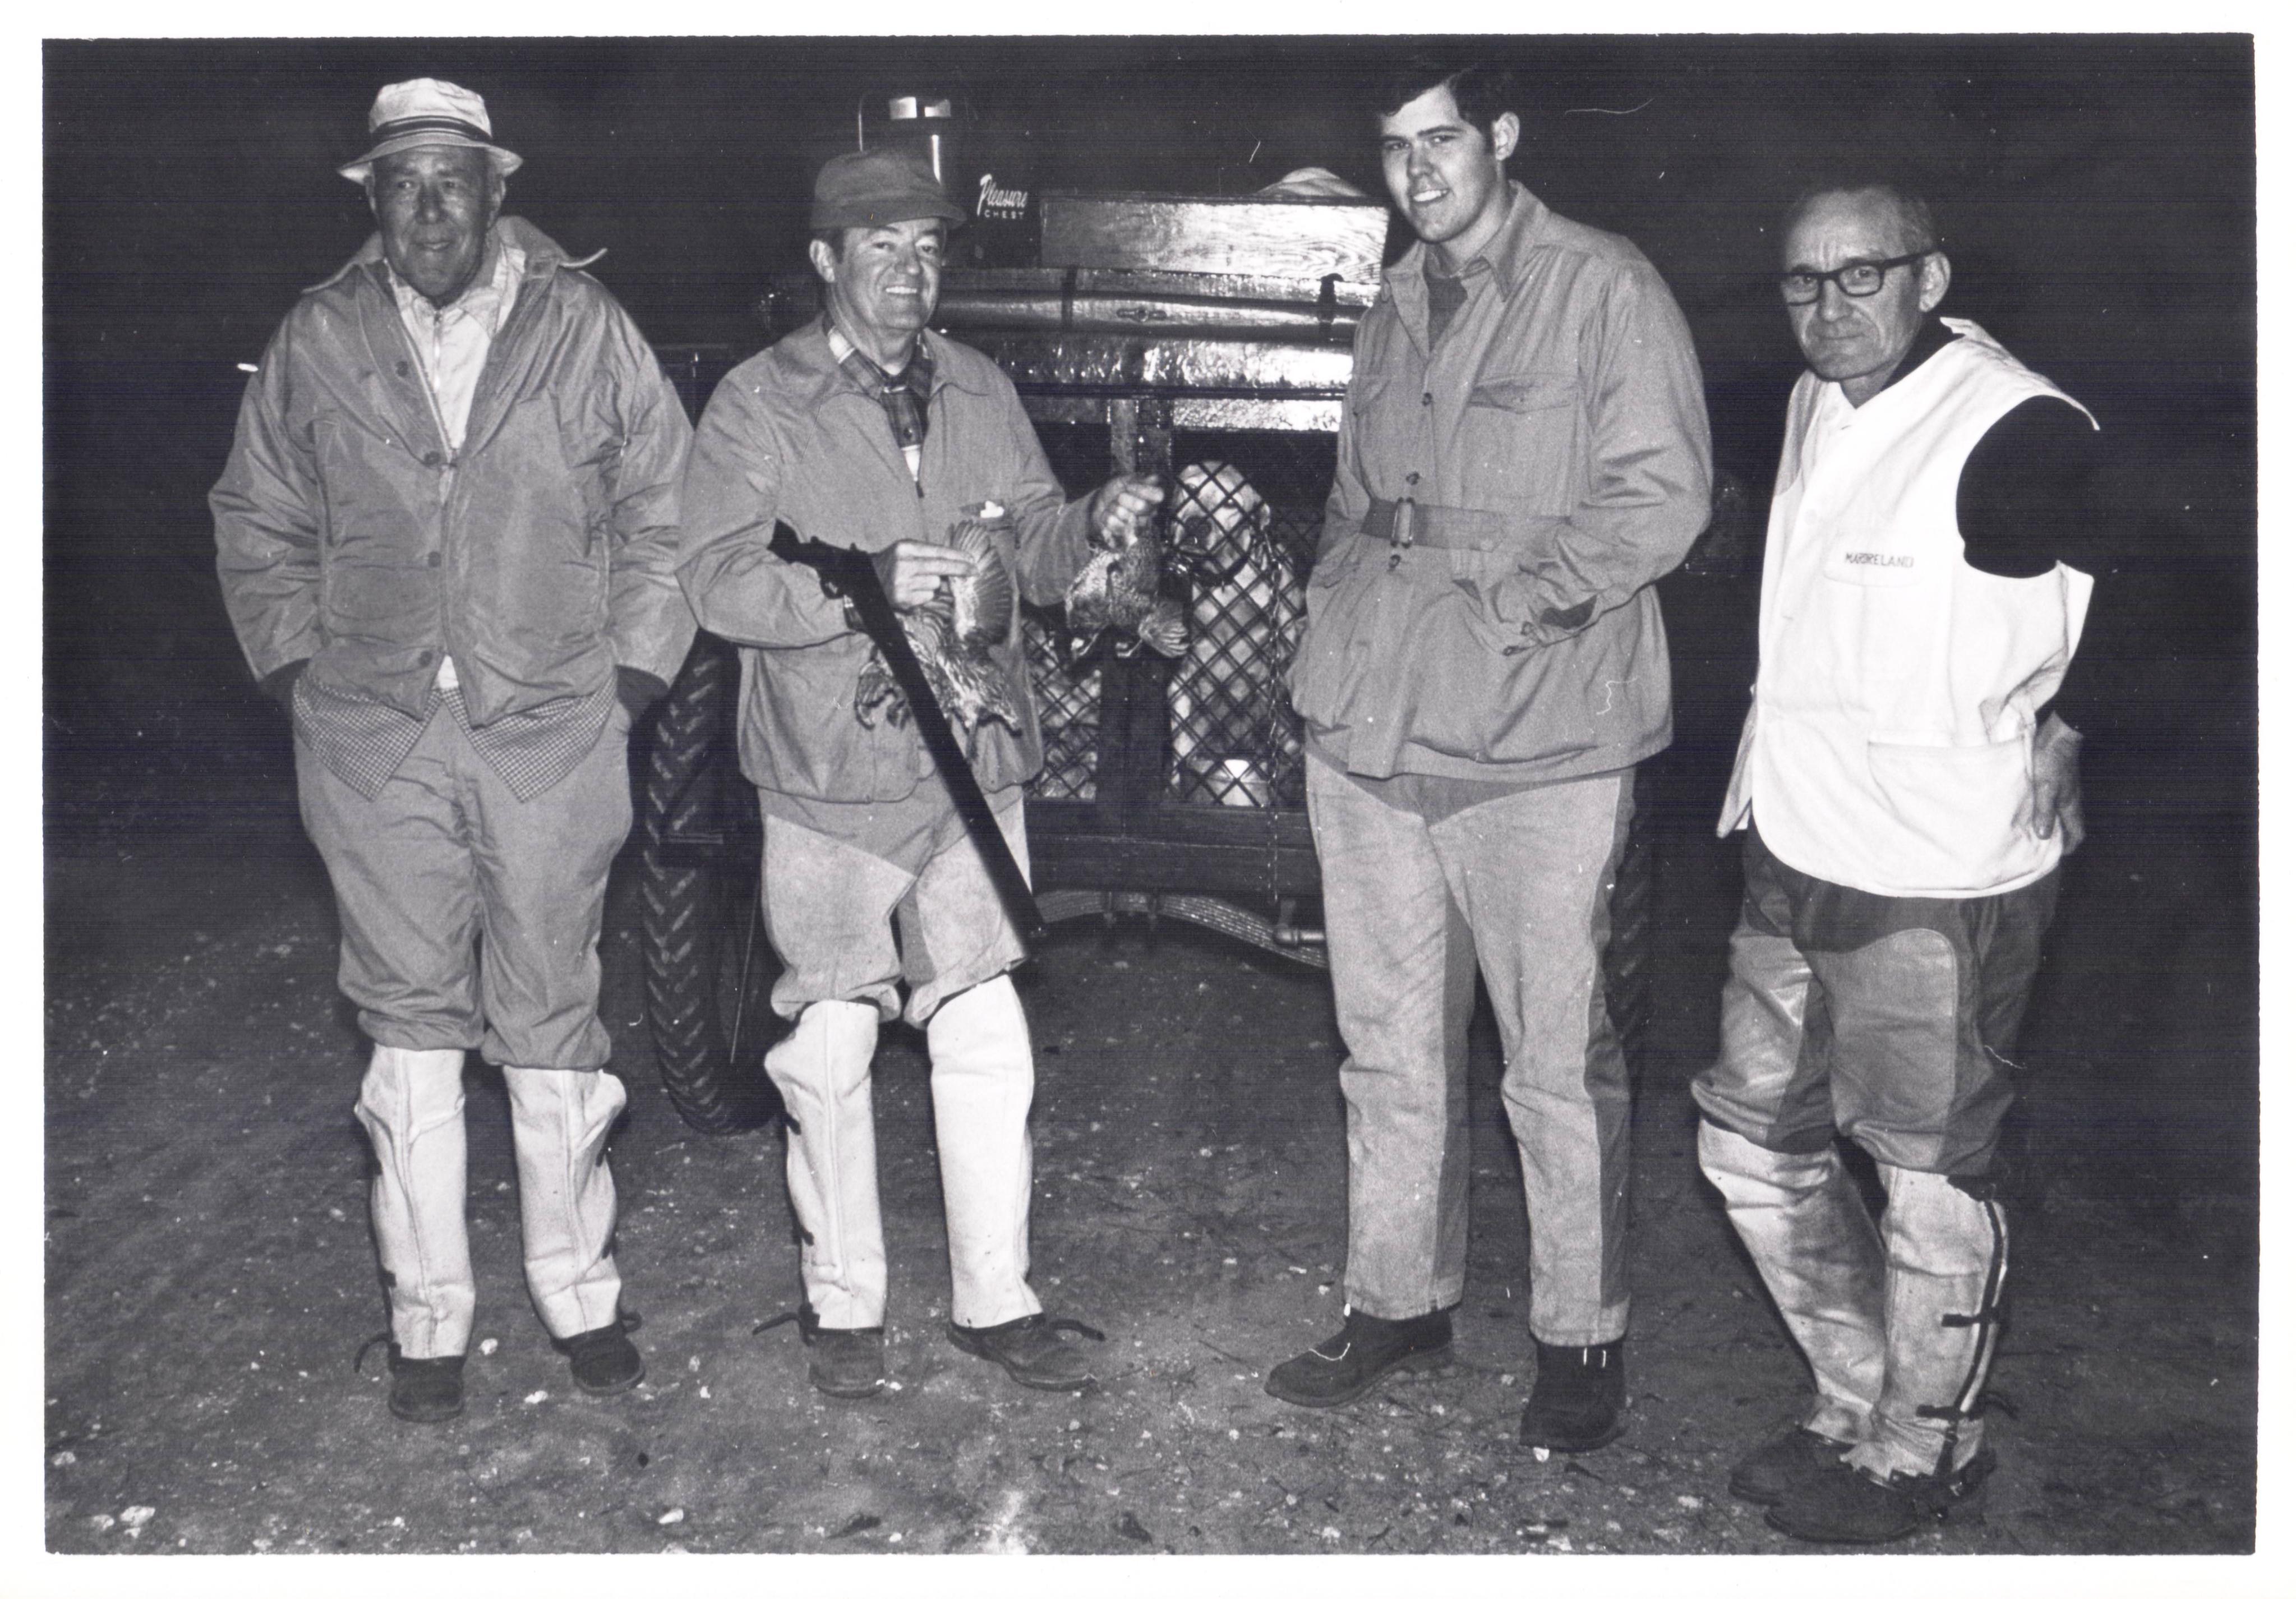 Hubert Humphrey with Ford Bell, Jr. at Mardreland Plantation, 1968